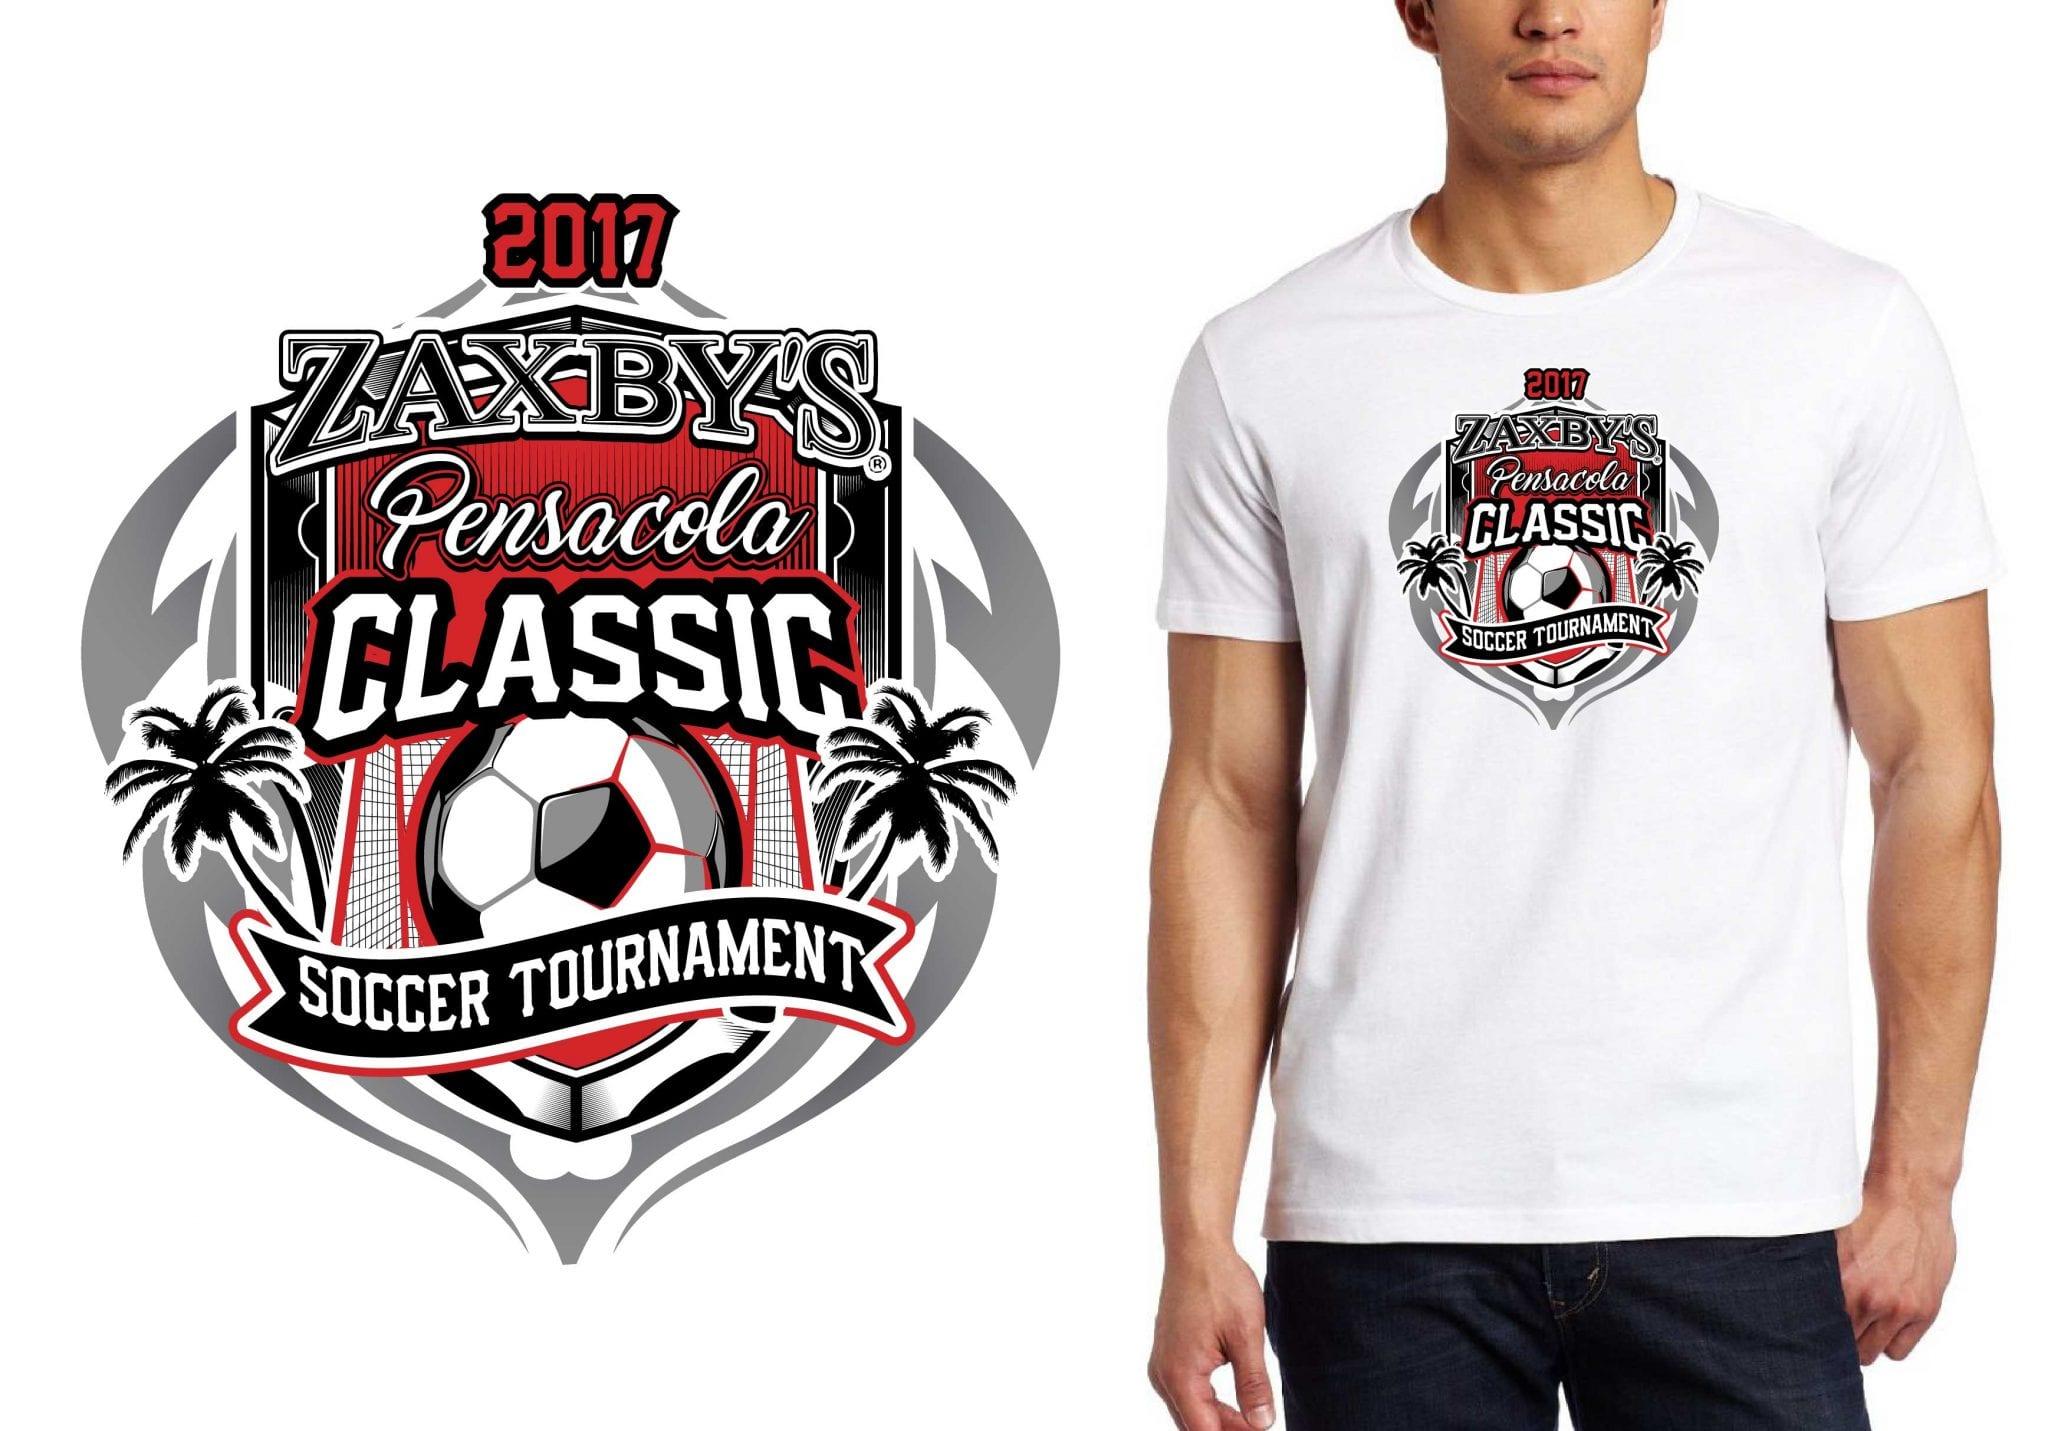 FRONT 2017 Zaxbys Pensacola Classic Soccer Tournament vector logo design for soccer t-shirt UrArtStudio